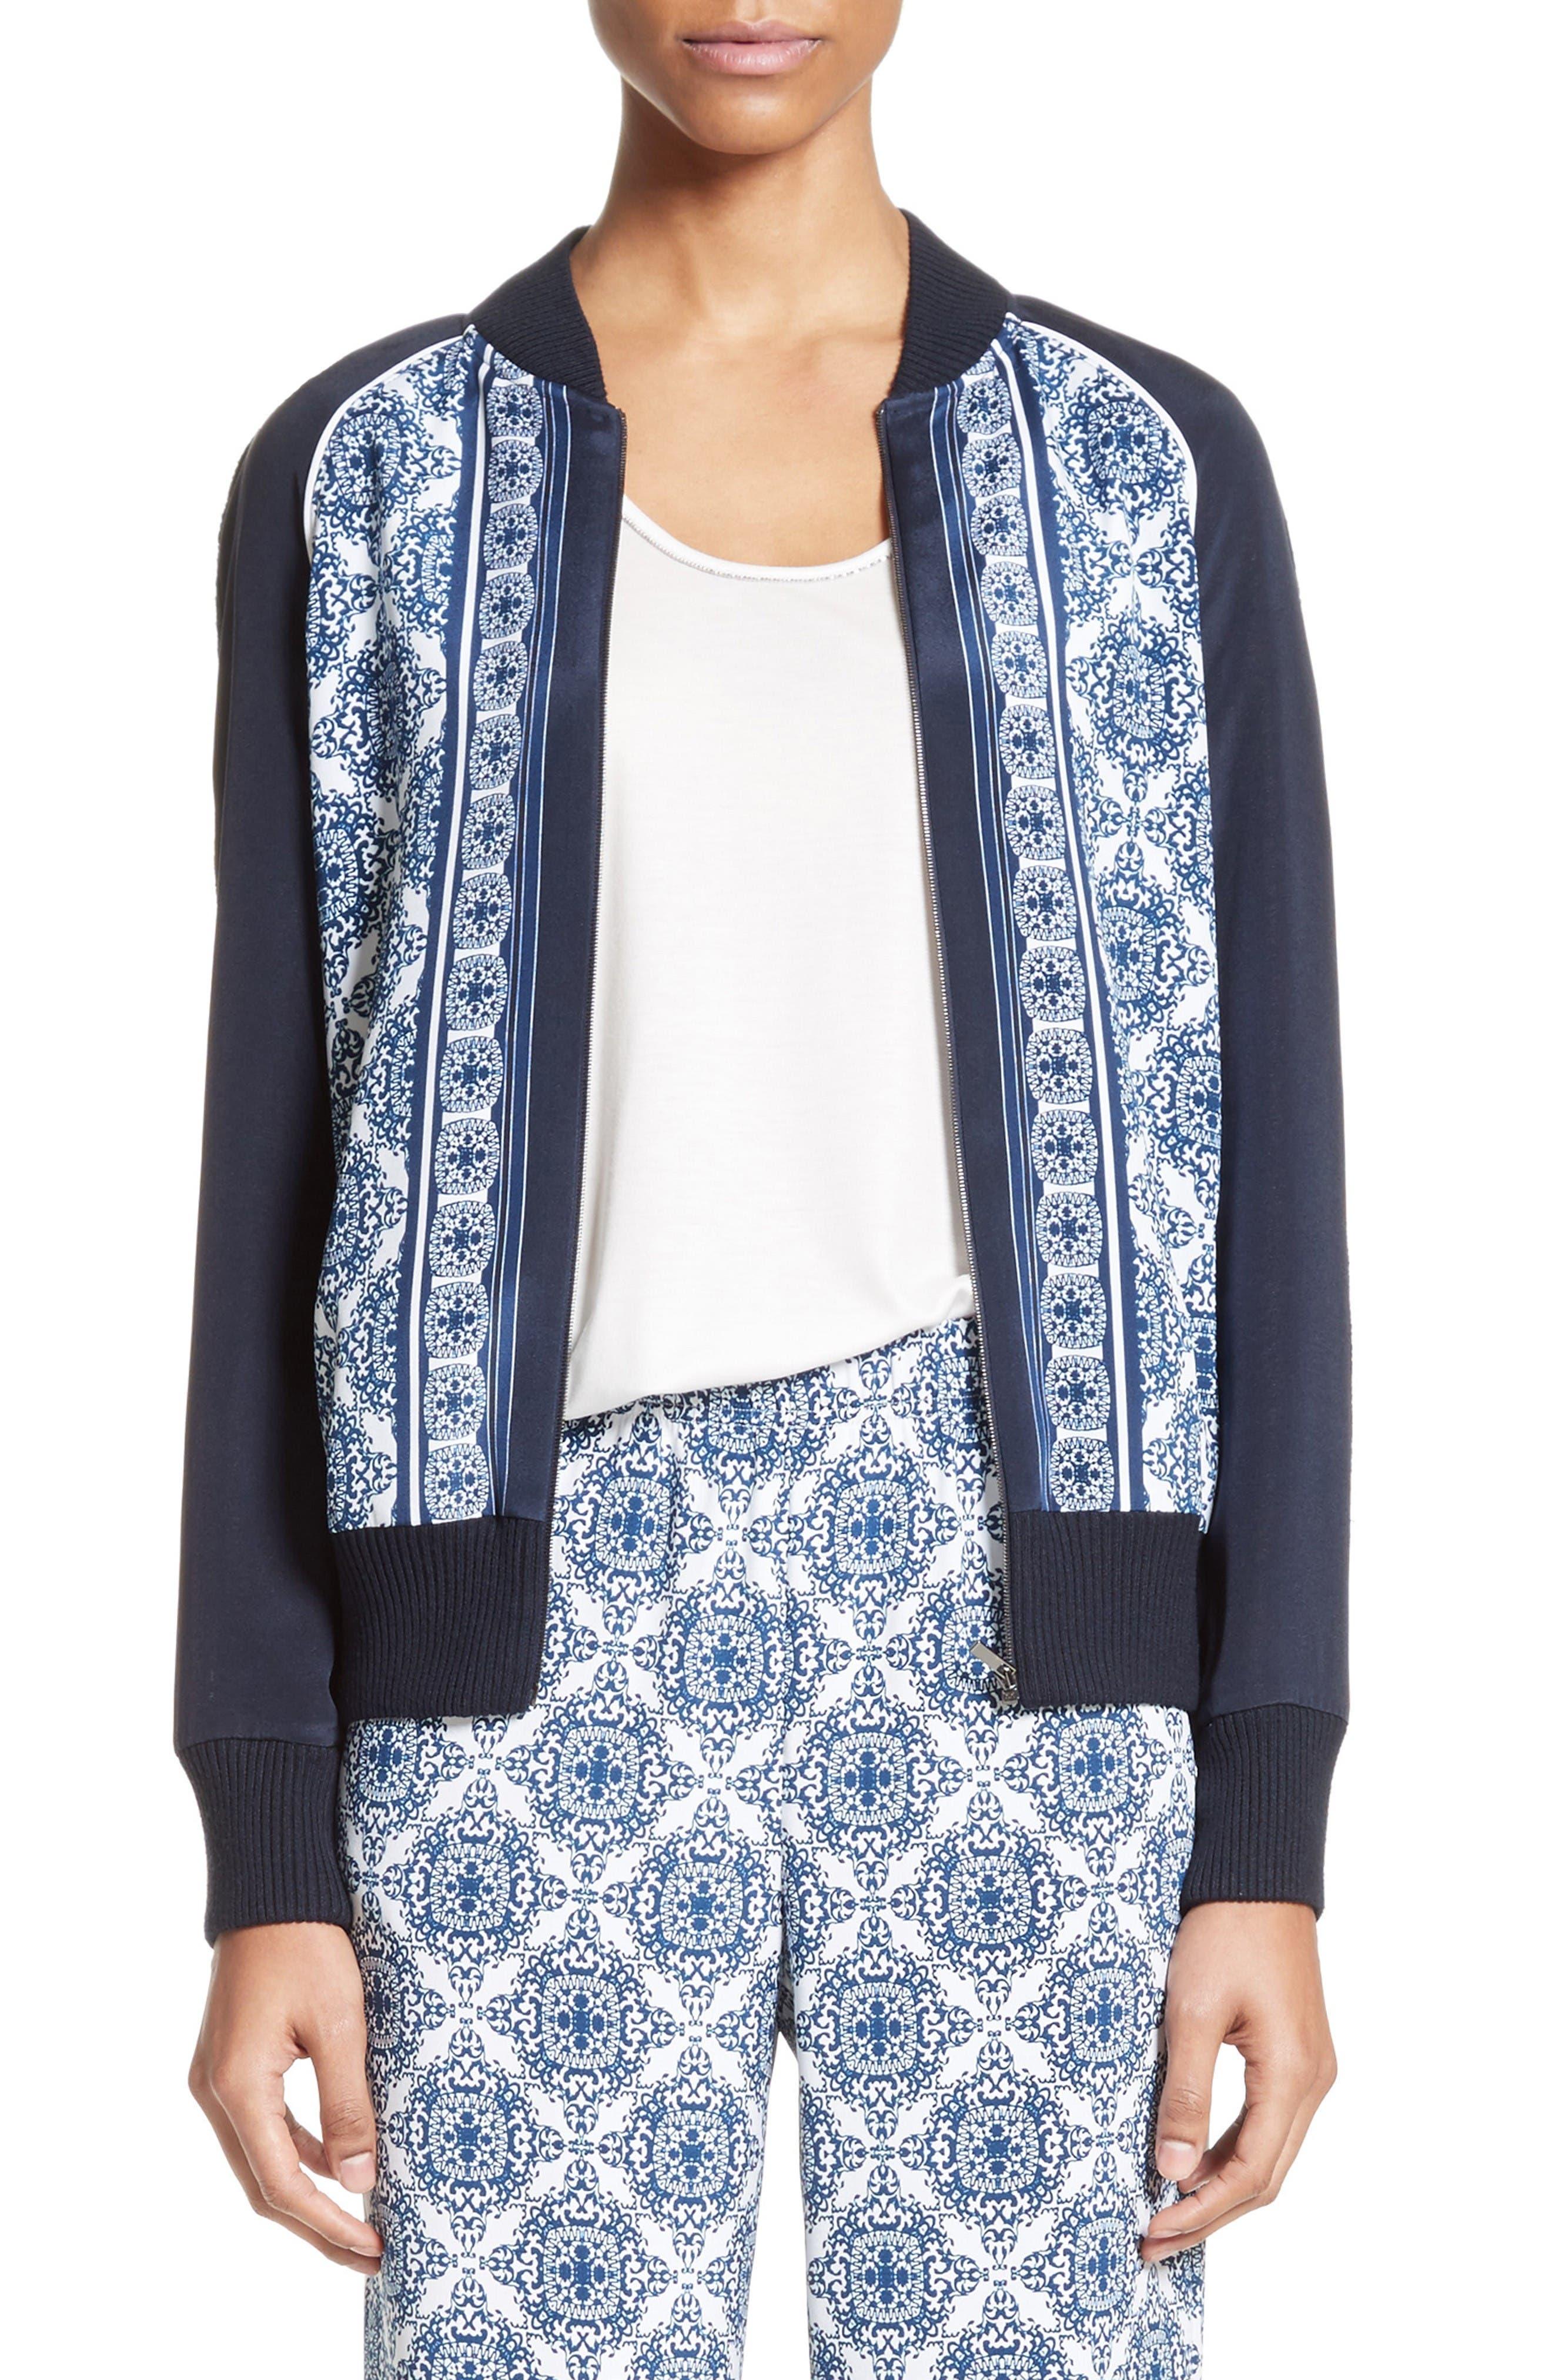 Main Image - St. John Collection Kali Tile Print Stretch Silk Crêpe de Chine Bomber Jacket